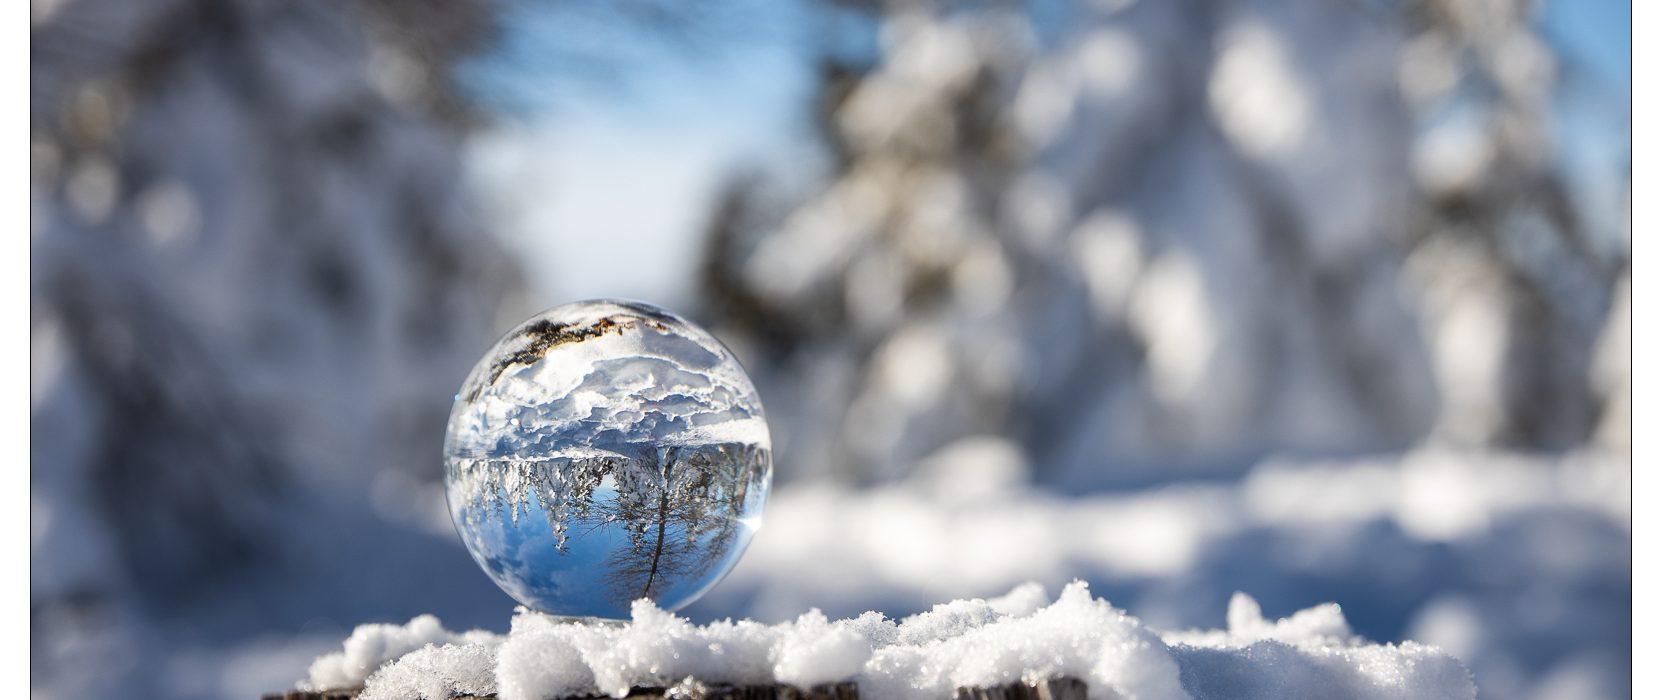 Winterlandschaft in Glaskugel